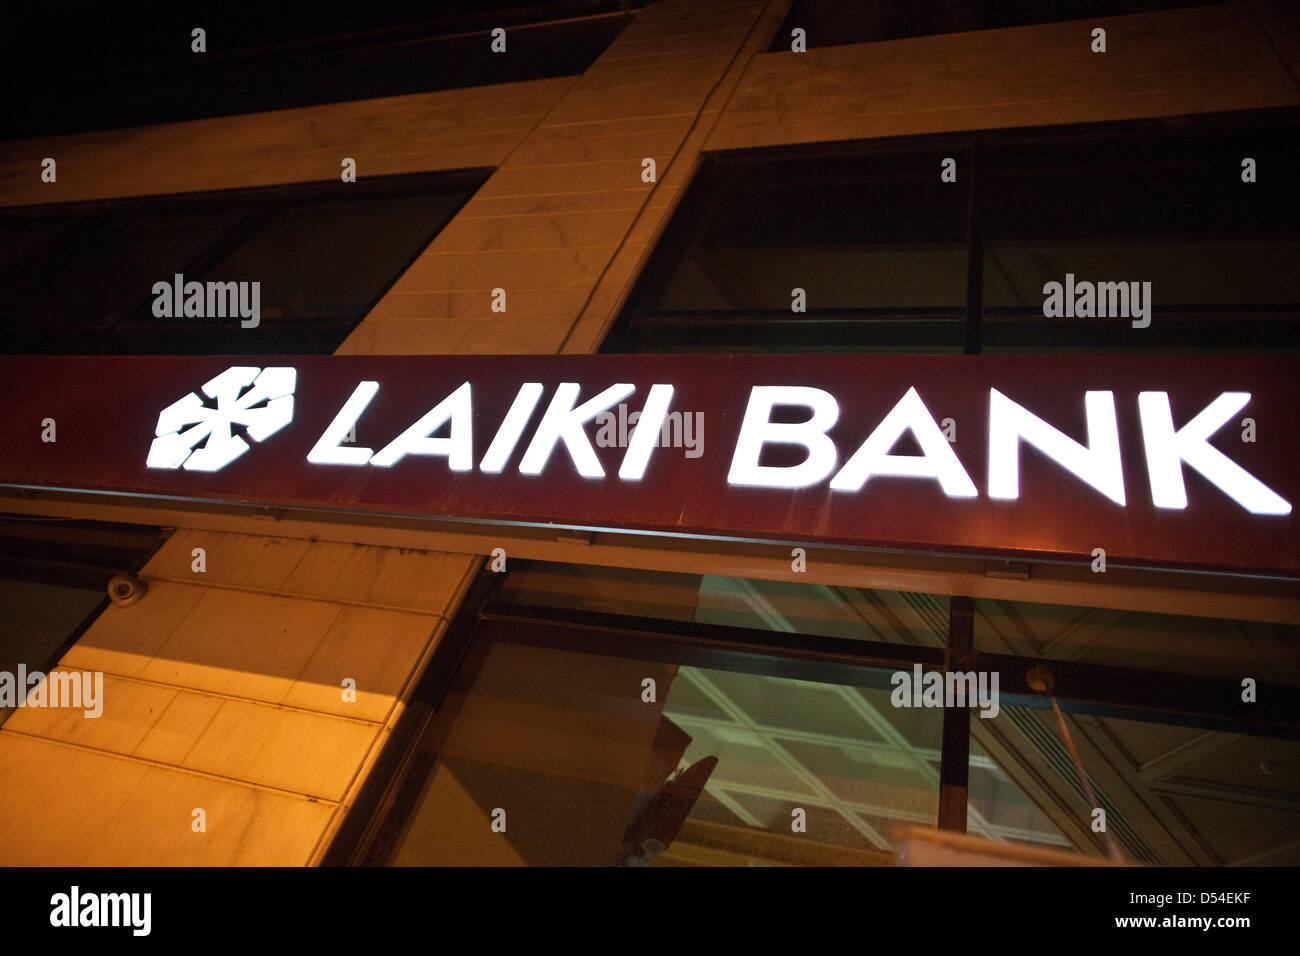 Laiki Bank, Nicosia, Cyprus. 24.03.2013 A branch of the Laiki Bank on the outskirts of Nicosia in Cyprus, as the - Stock Image